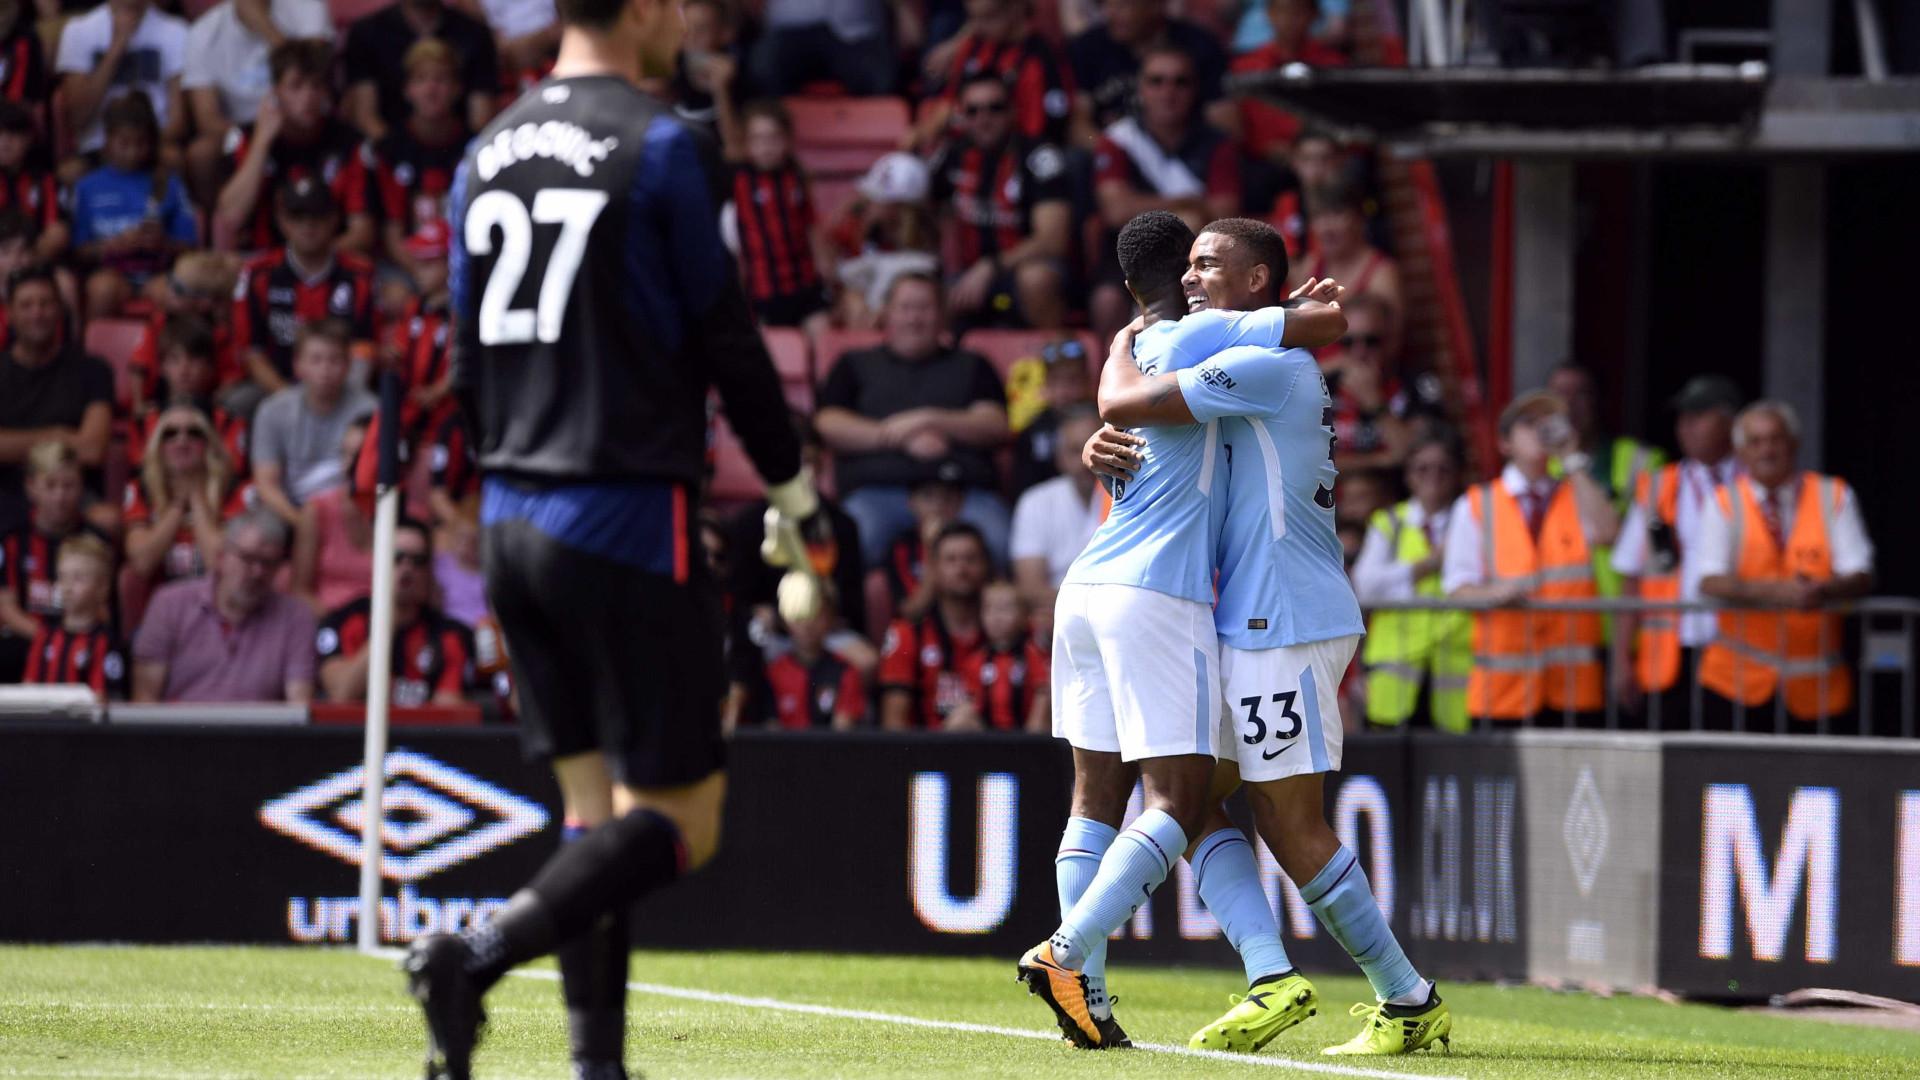 Manchester City vence Bournemouth nos acréscimos